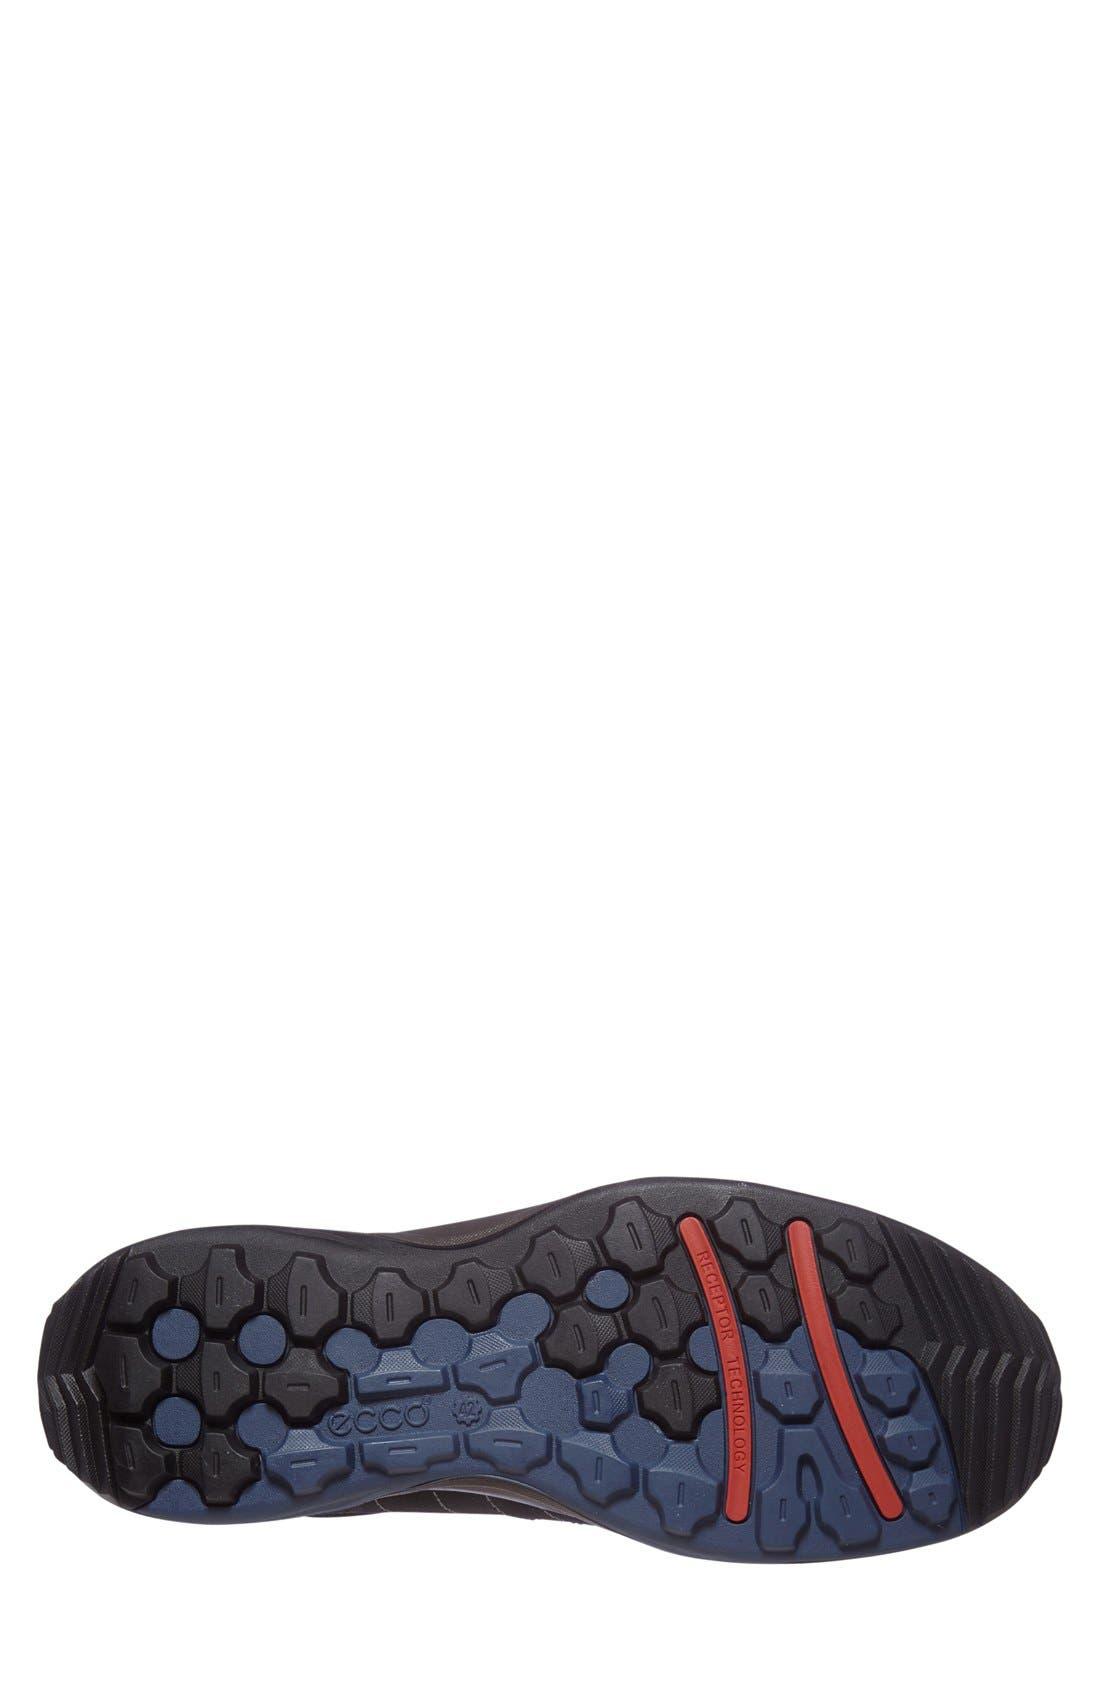 'Sierra II' Sneaker,                             Alternate thumbnail 4, color,                             003